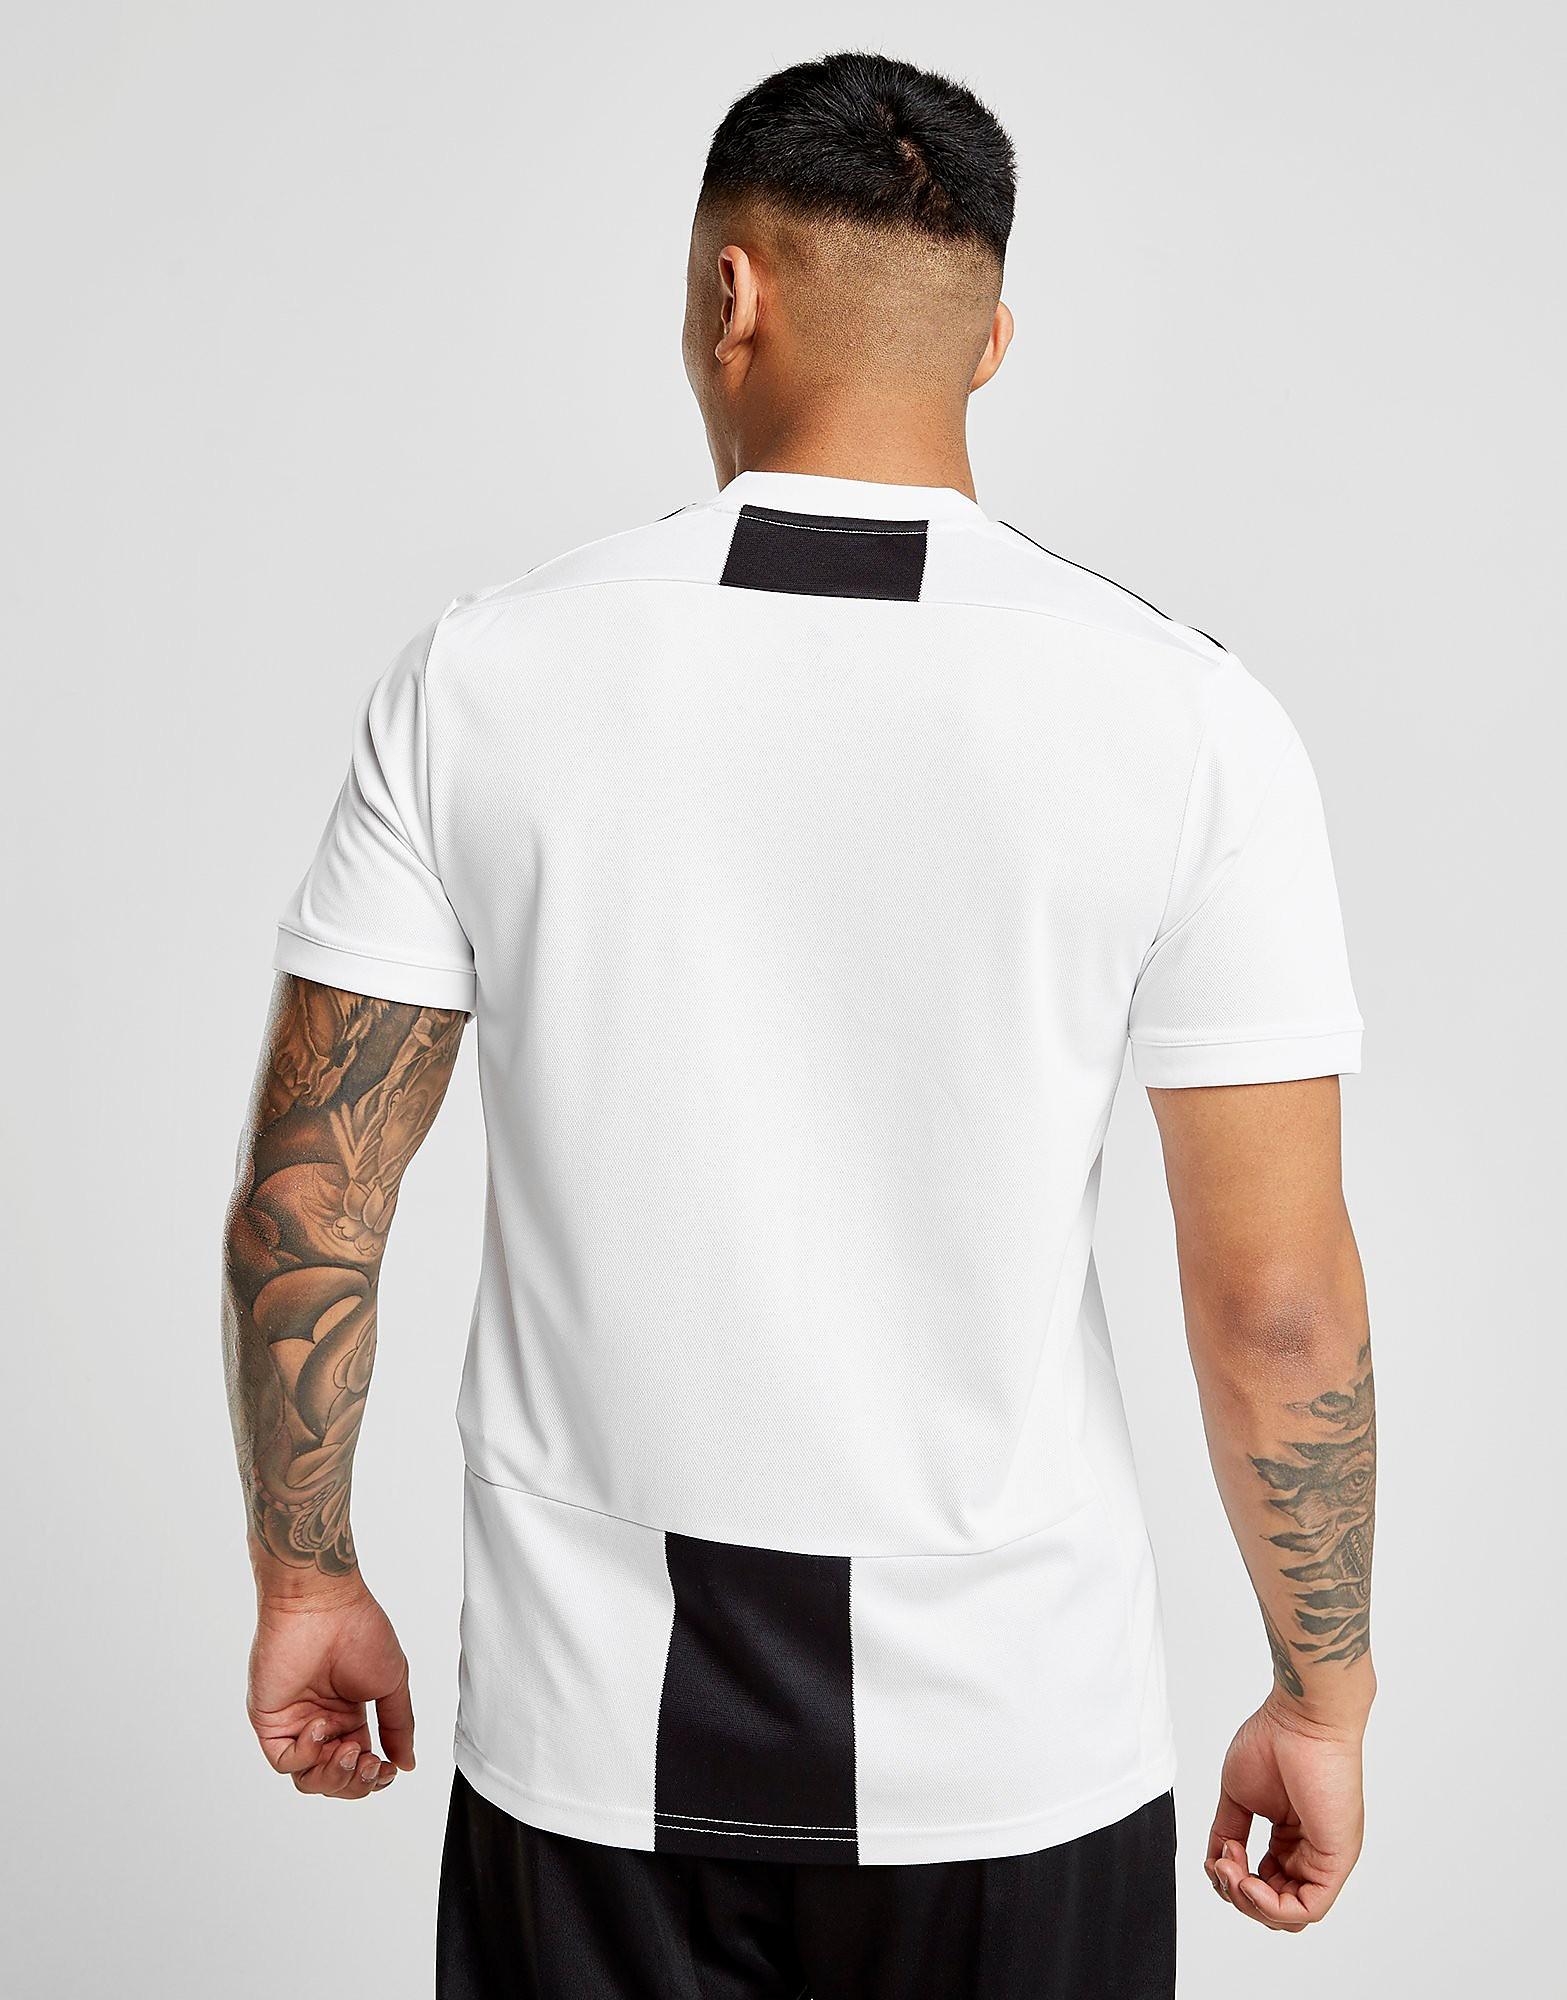 adidas Juventus 2018/19 Home Shirt